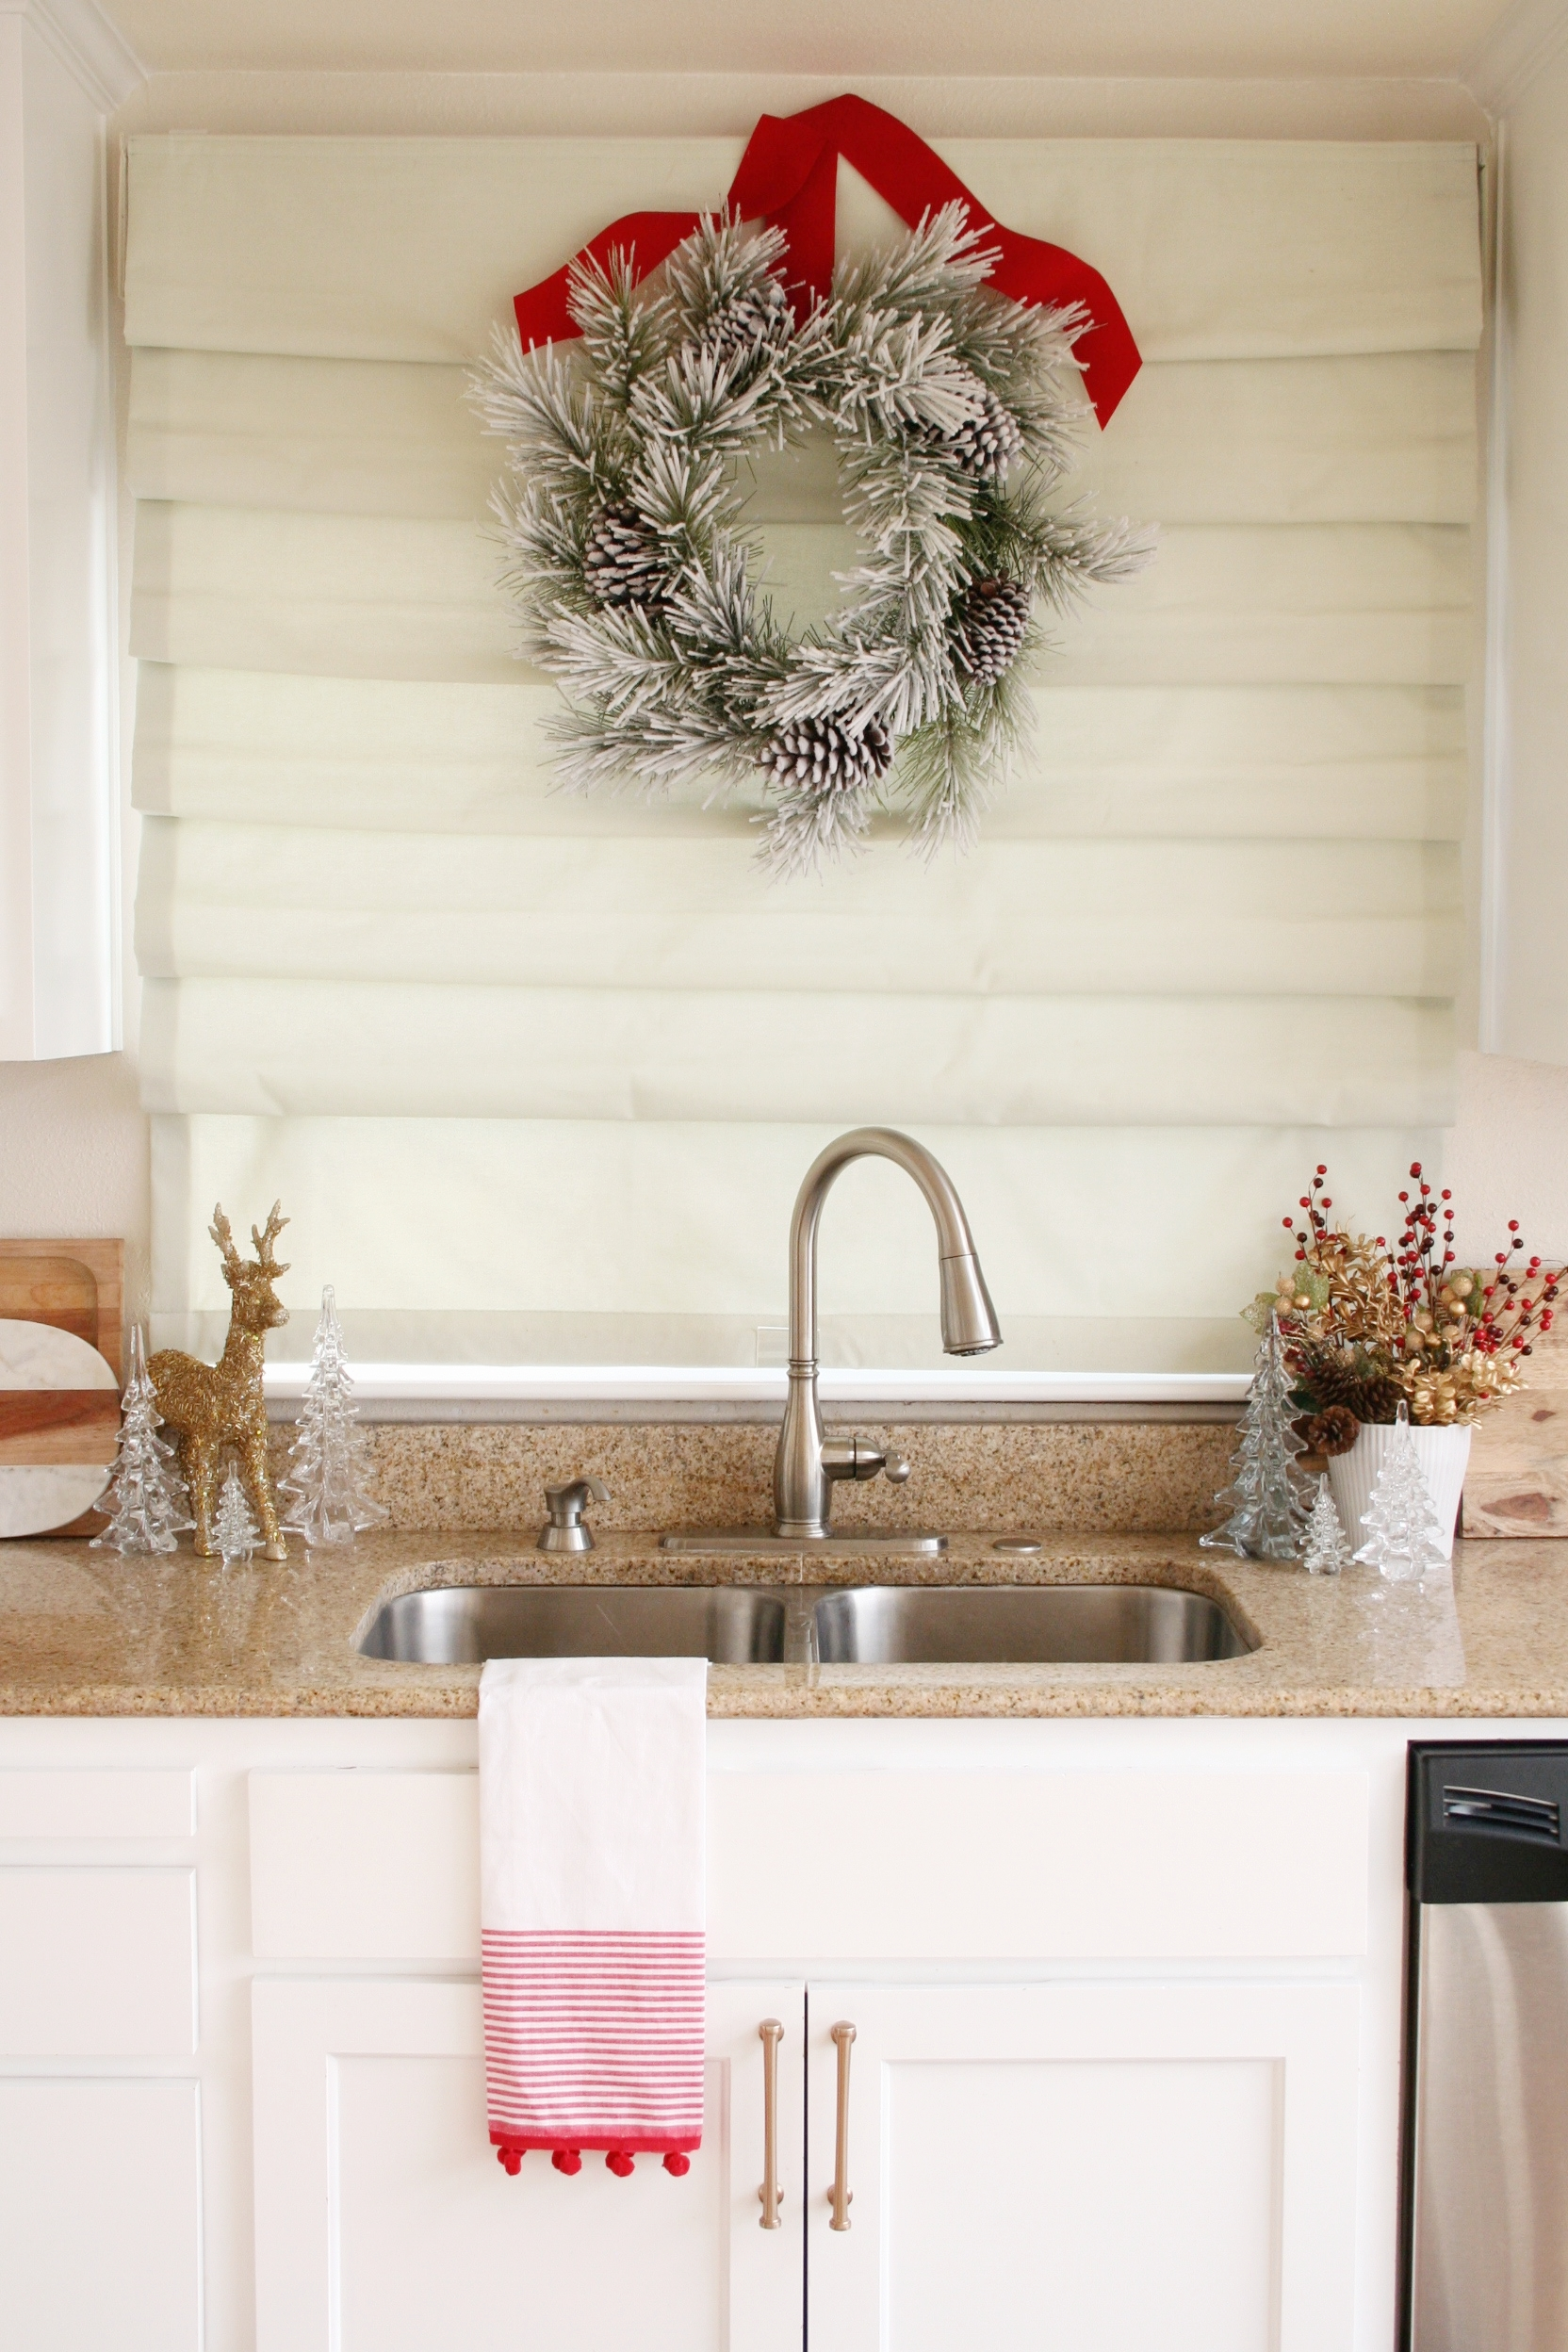 Christmas Wreath over Sink